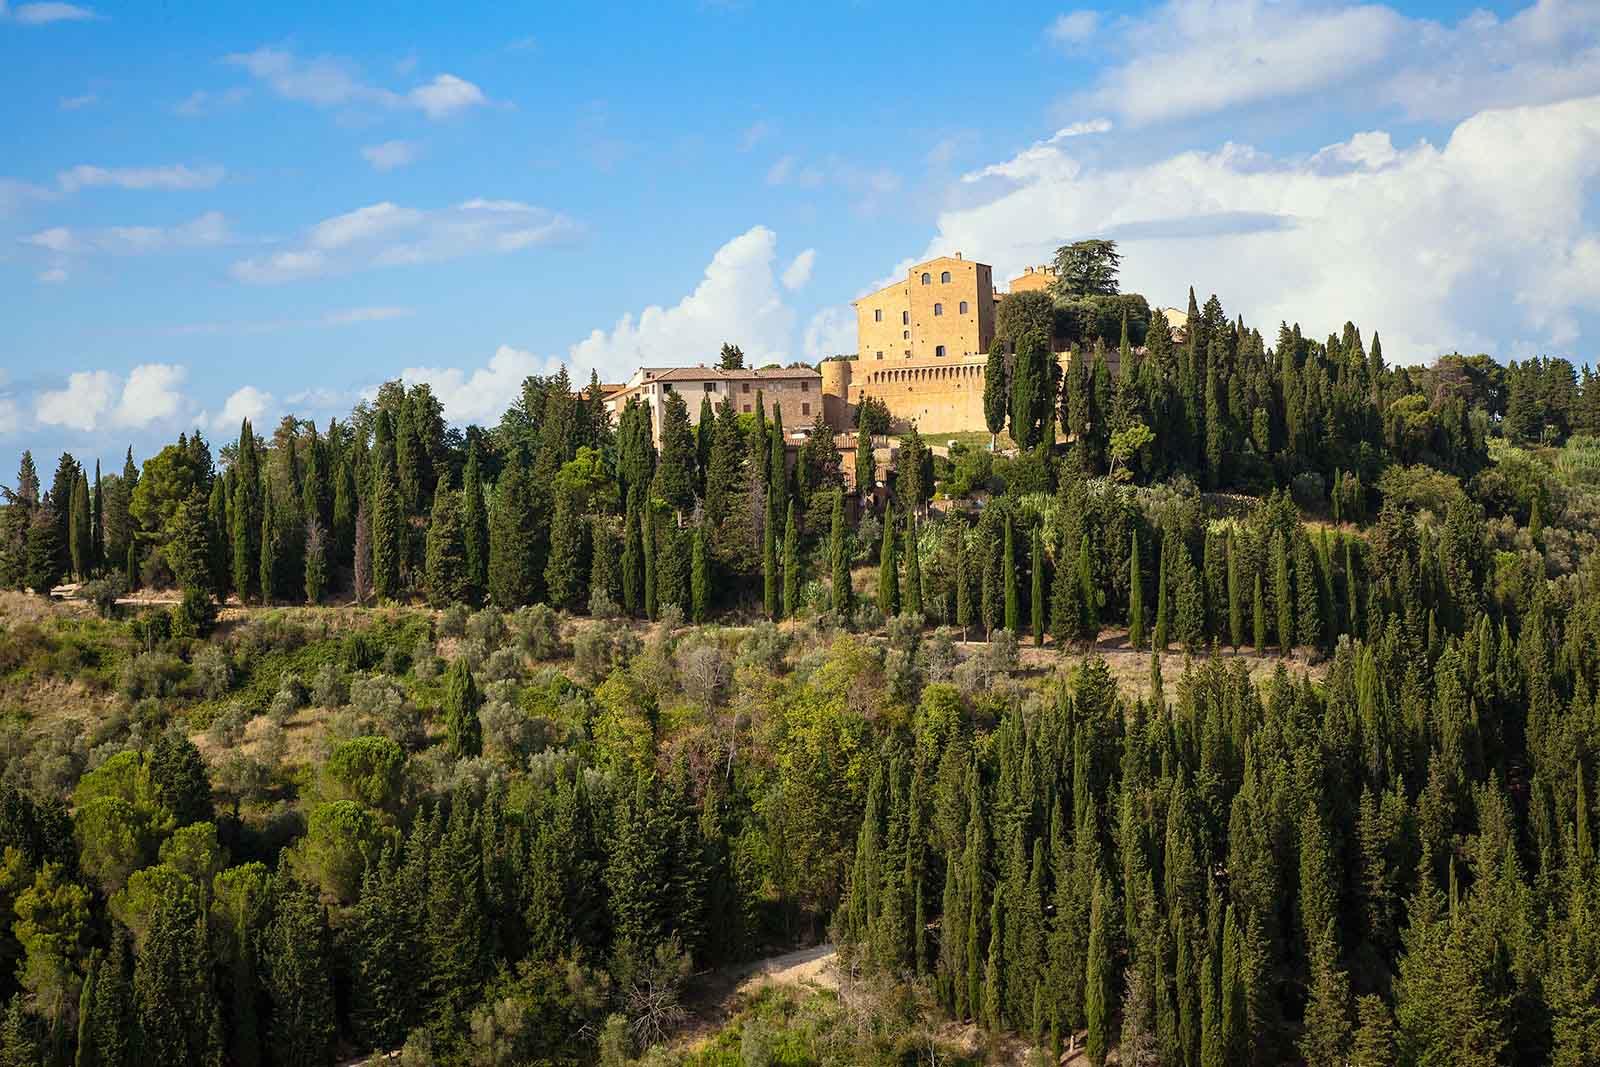 Toscana Resort Castelfalfi, il castello